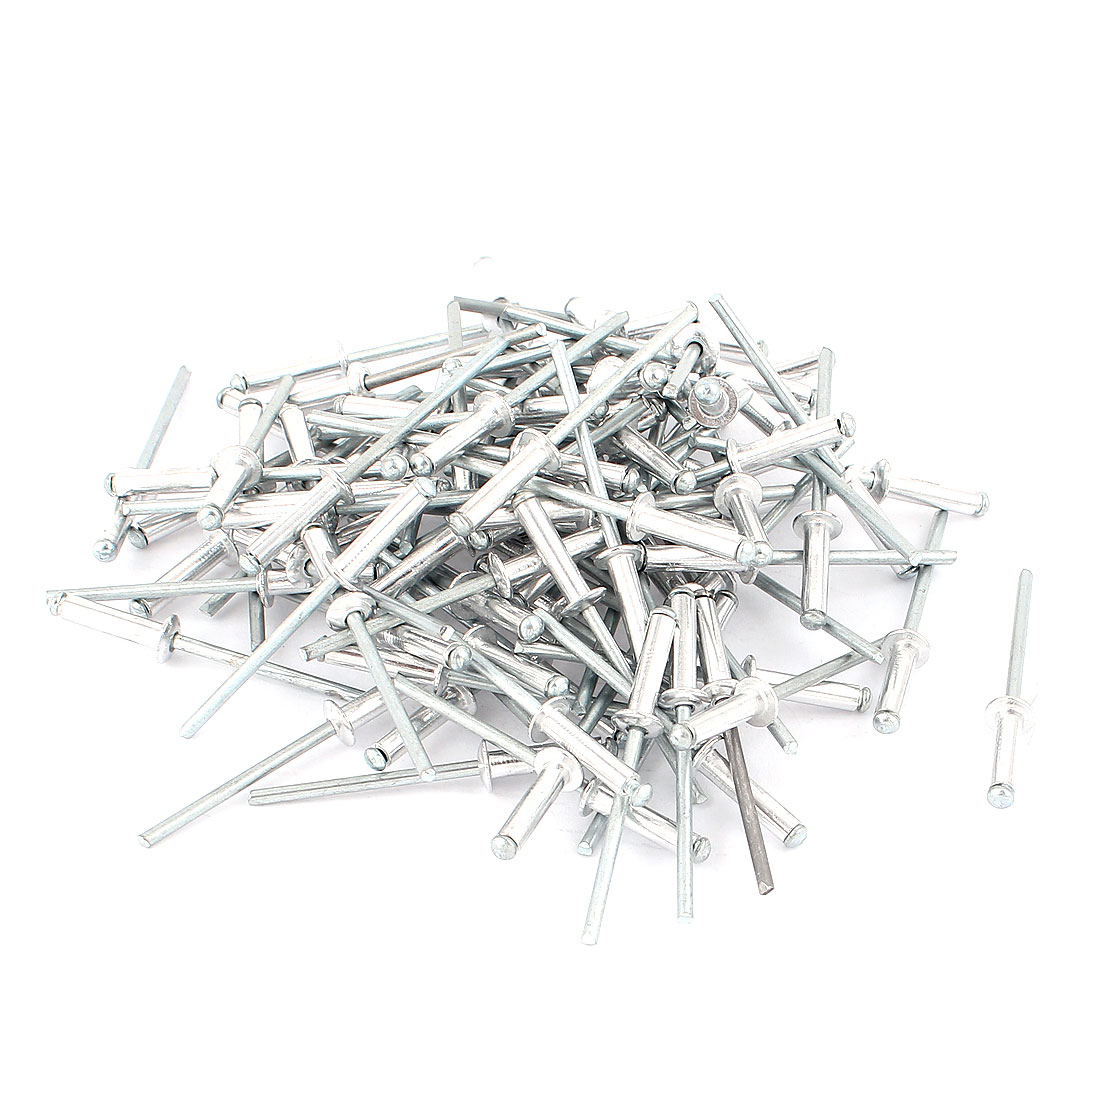 "100 Pcs 3.2mm 1/8"" Aluminium Large Flange Blind Pop Rivets"